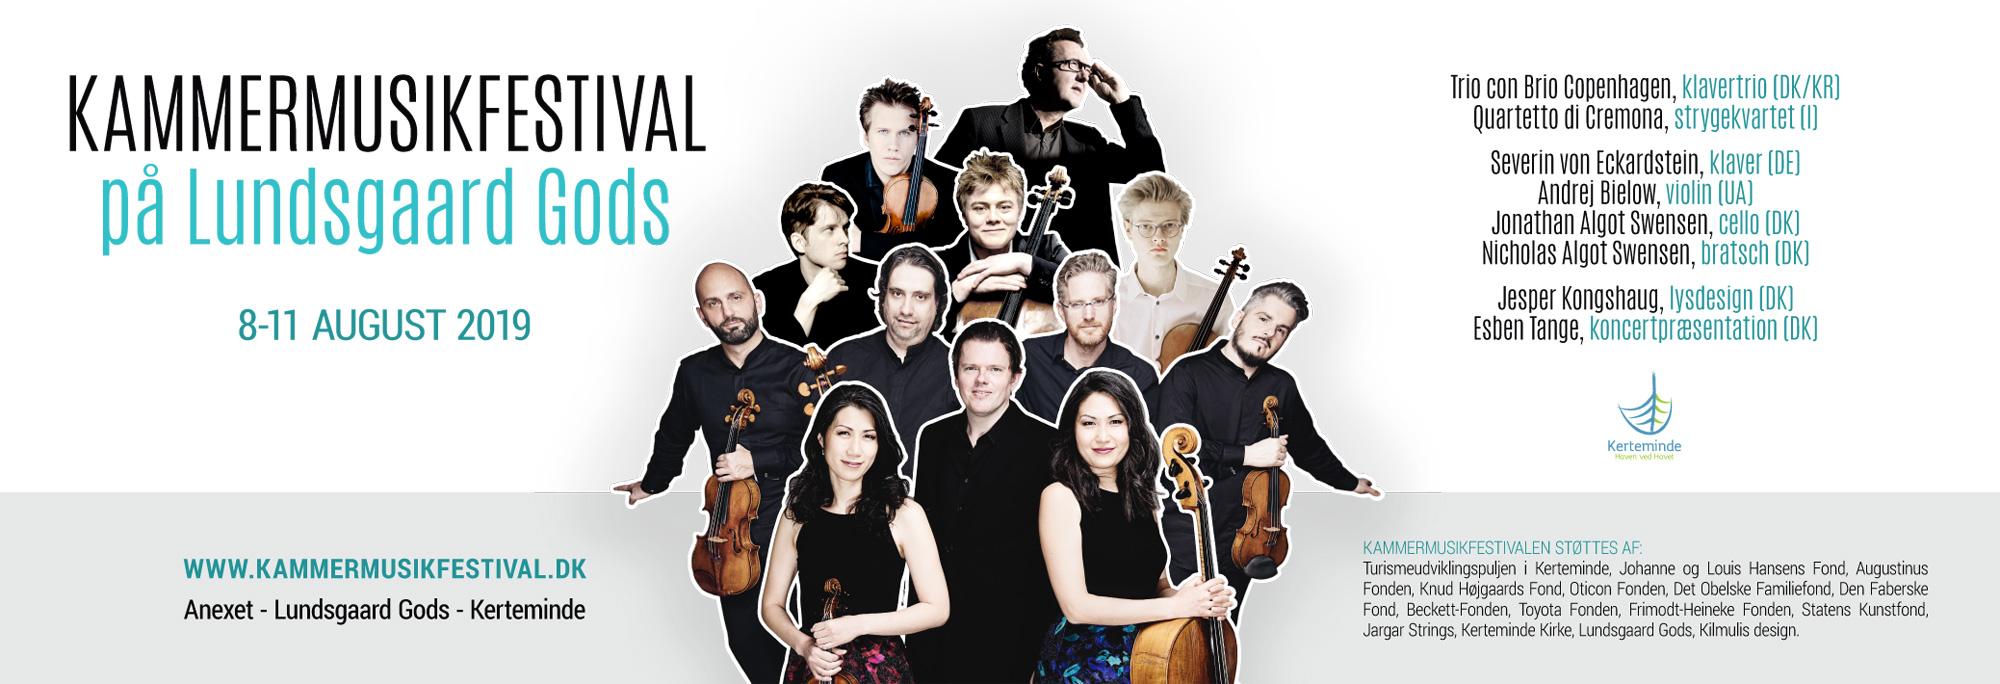 Kilmulis design - Kerteminde Kammermusikfestival - poster 03